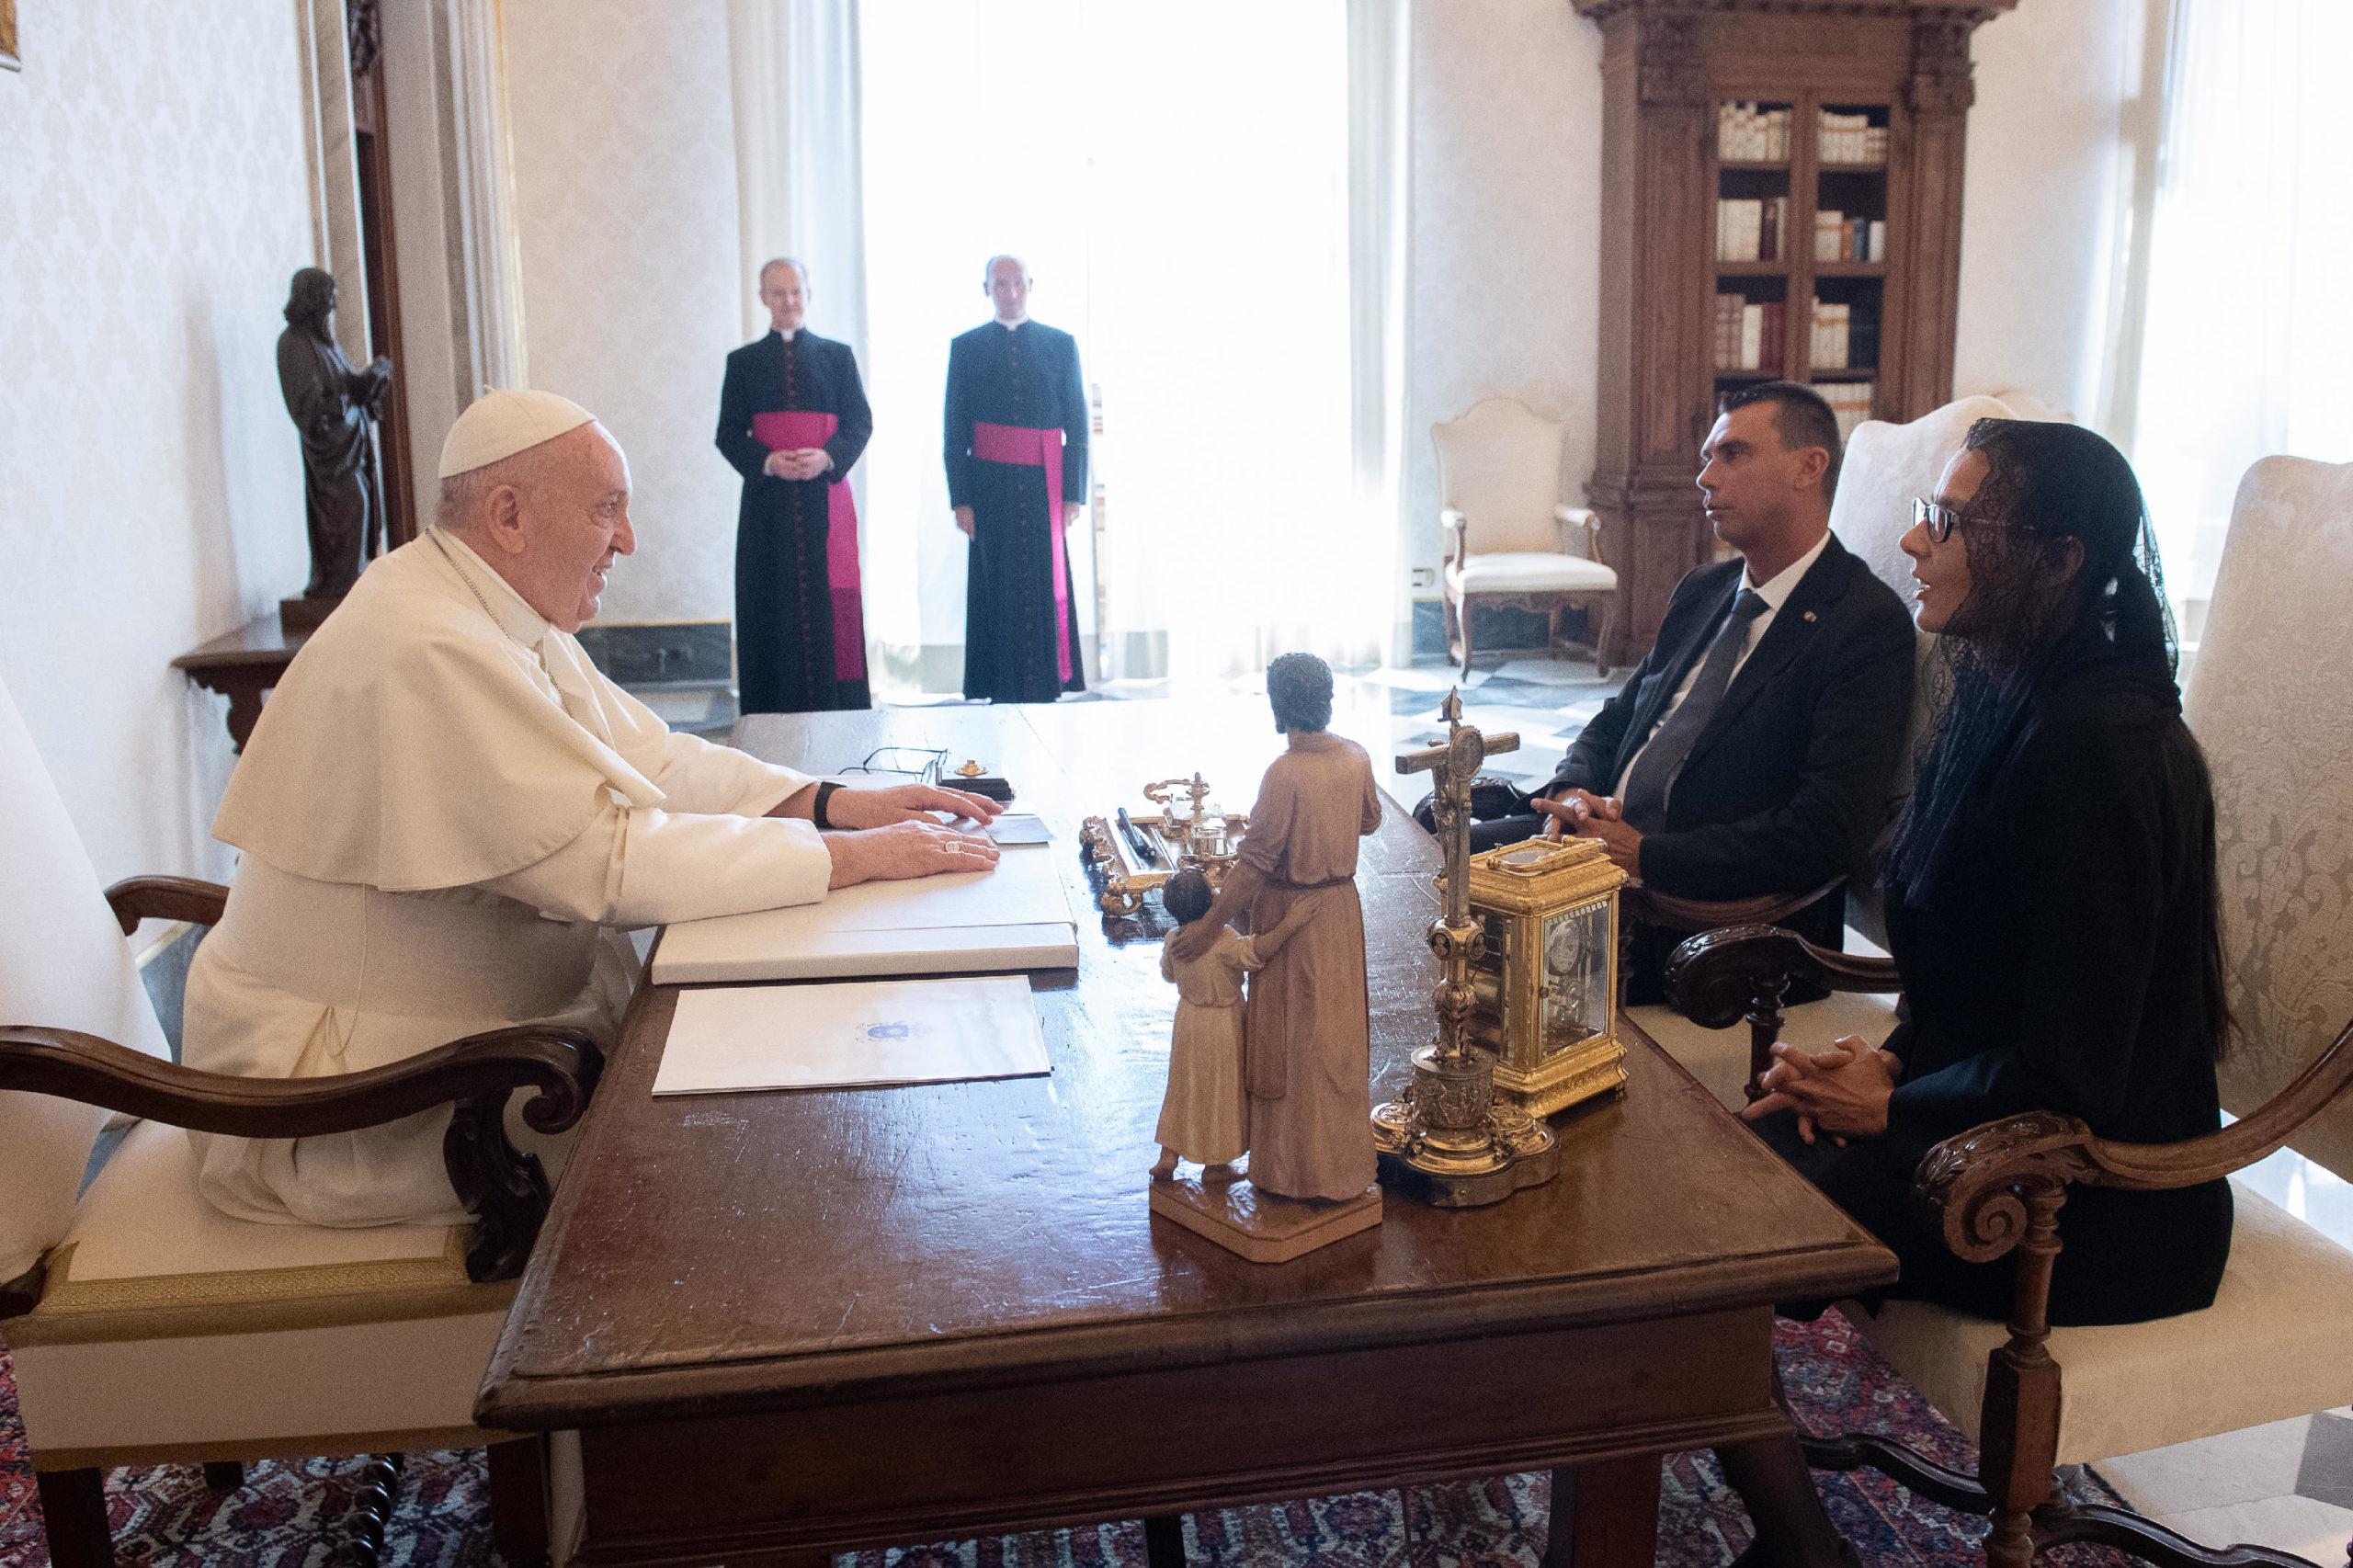 Capitaines-régents de Saint-Marin, 5 septembre 2020 © Vatican Media